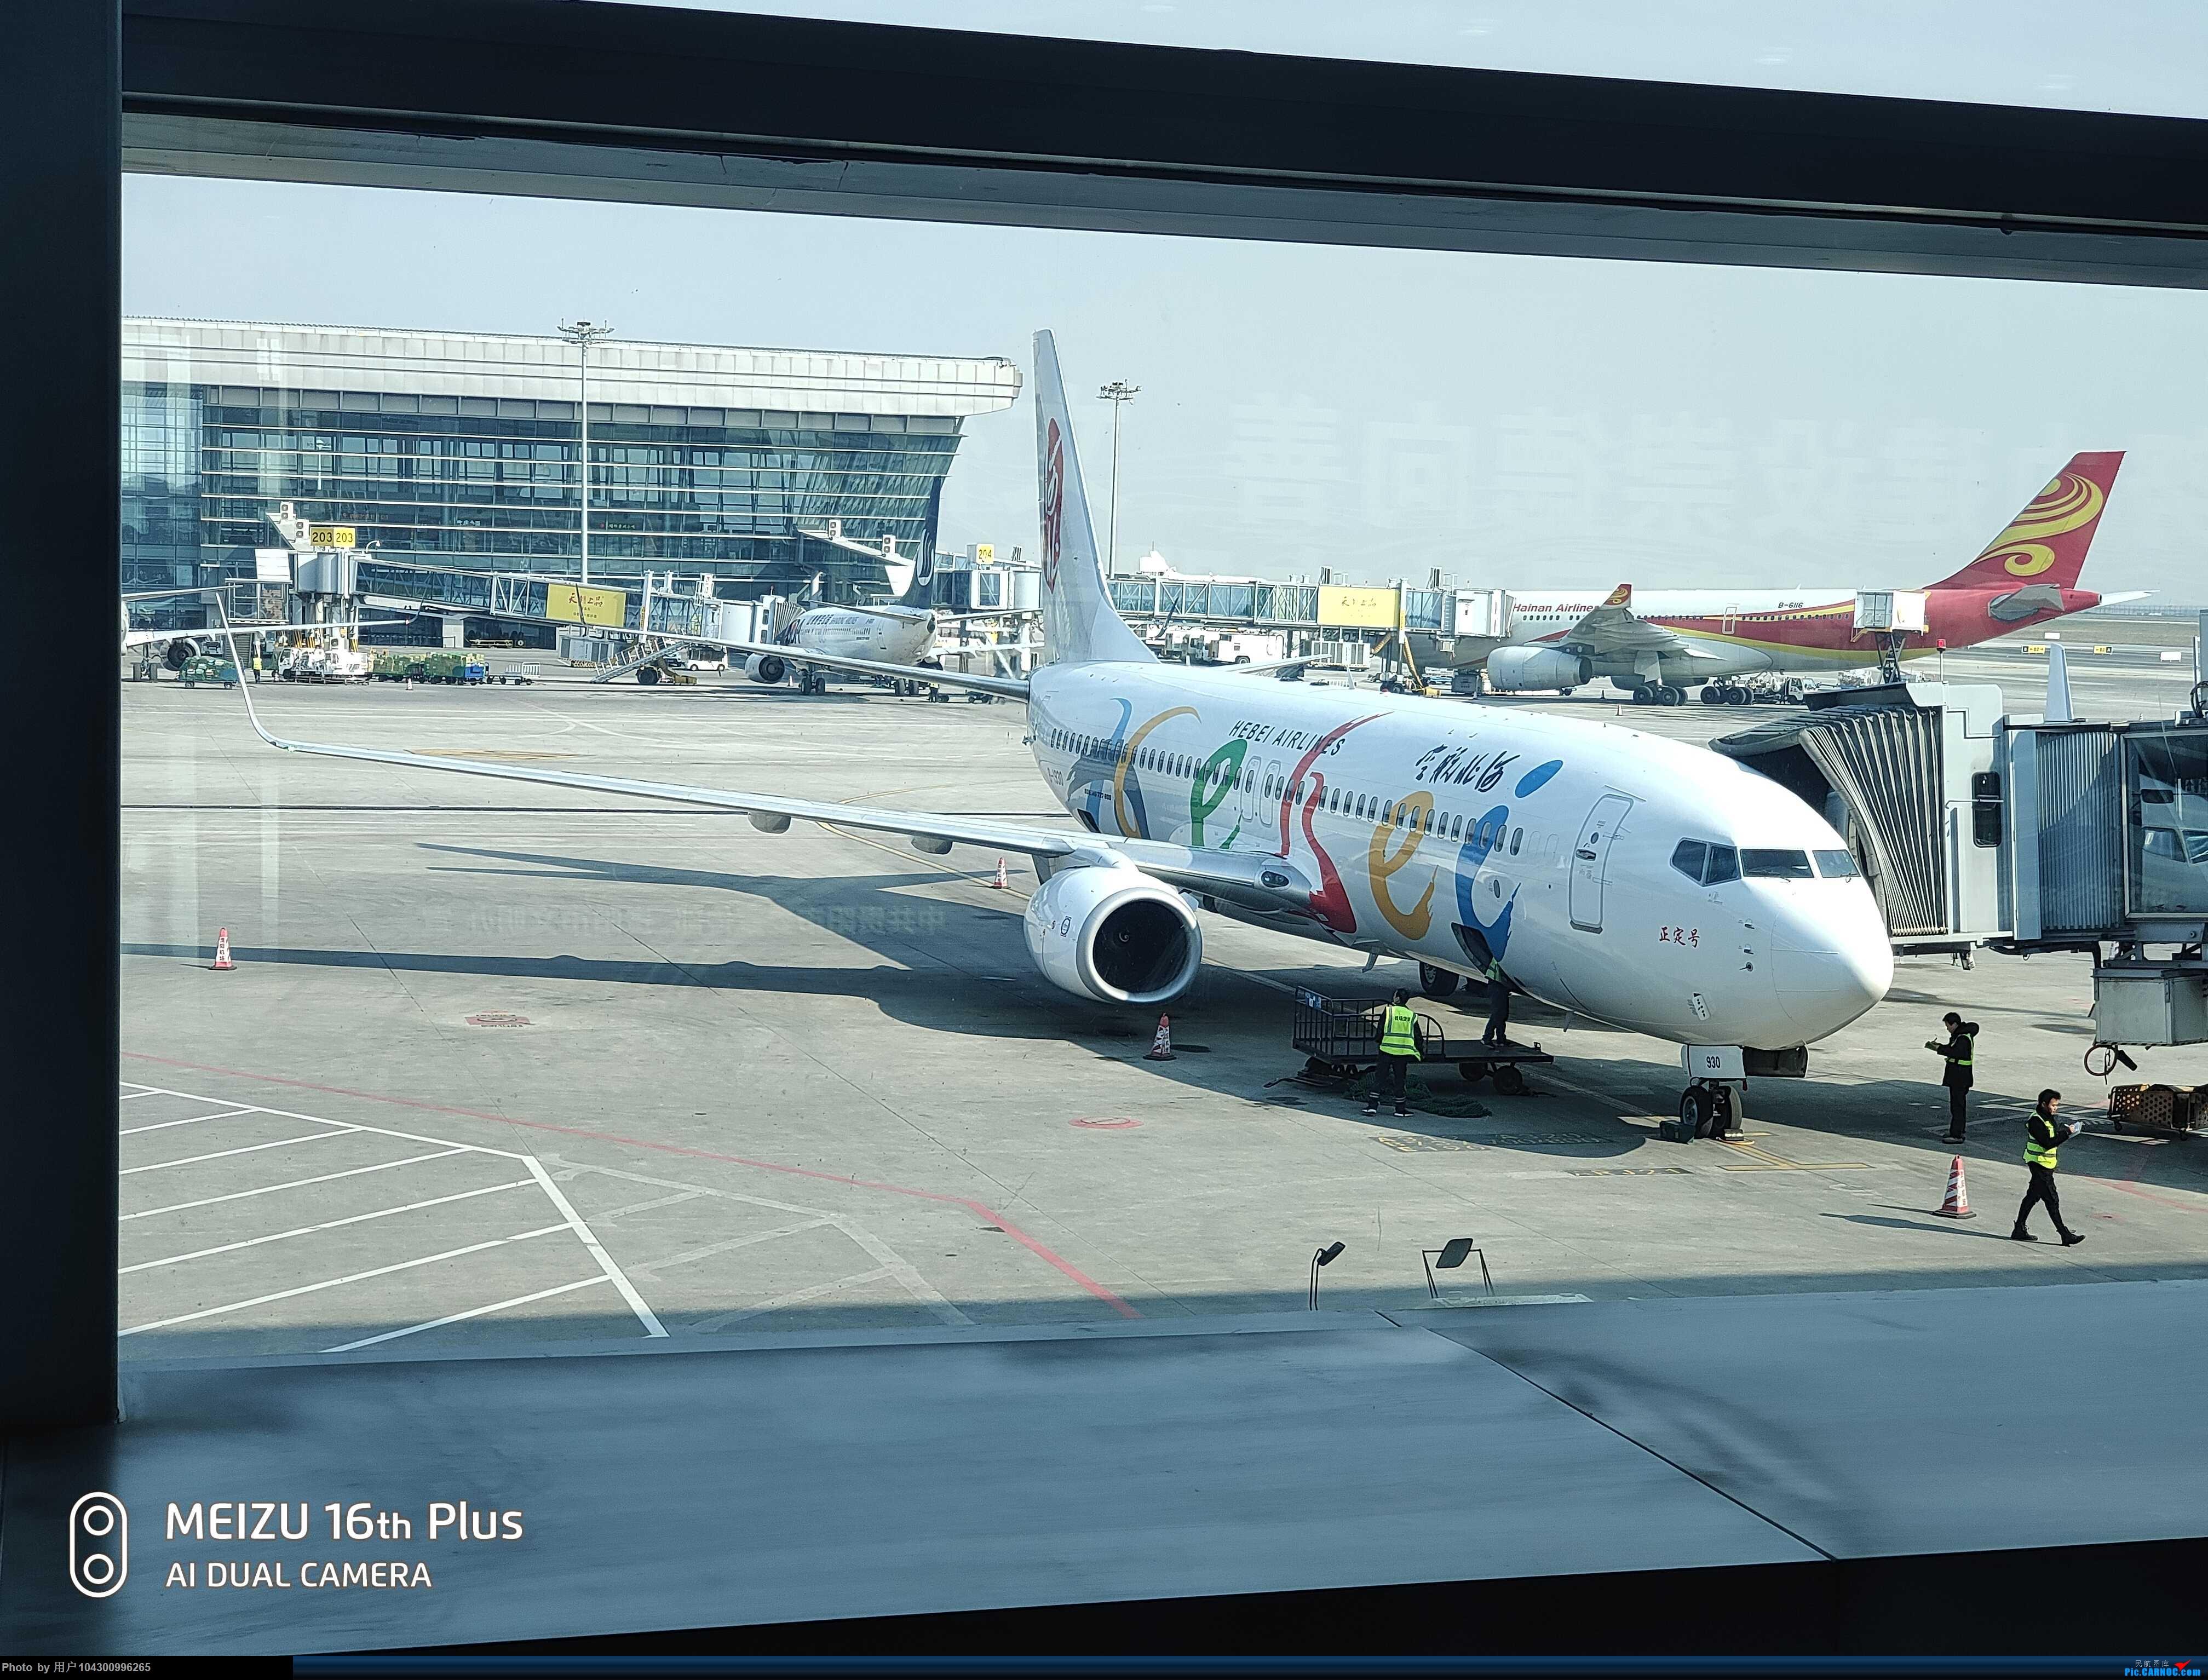 Re:[原创]DM游记之AQ&TV贵阳-兰州往返 BOEING 737-800 B-1930 中国贵阳龙洞堡国际机场